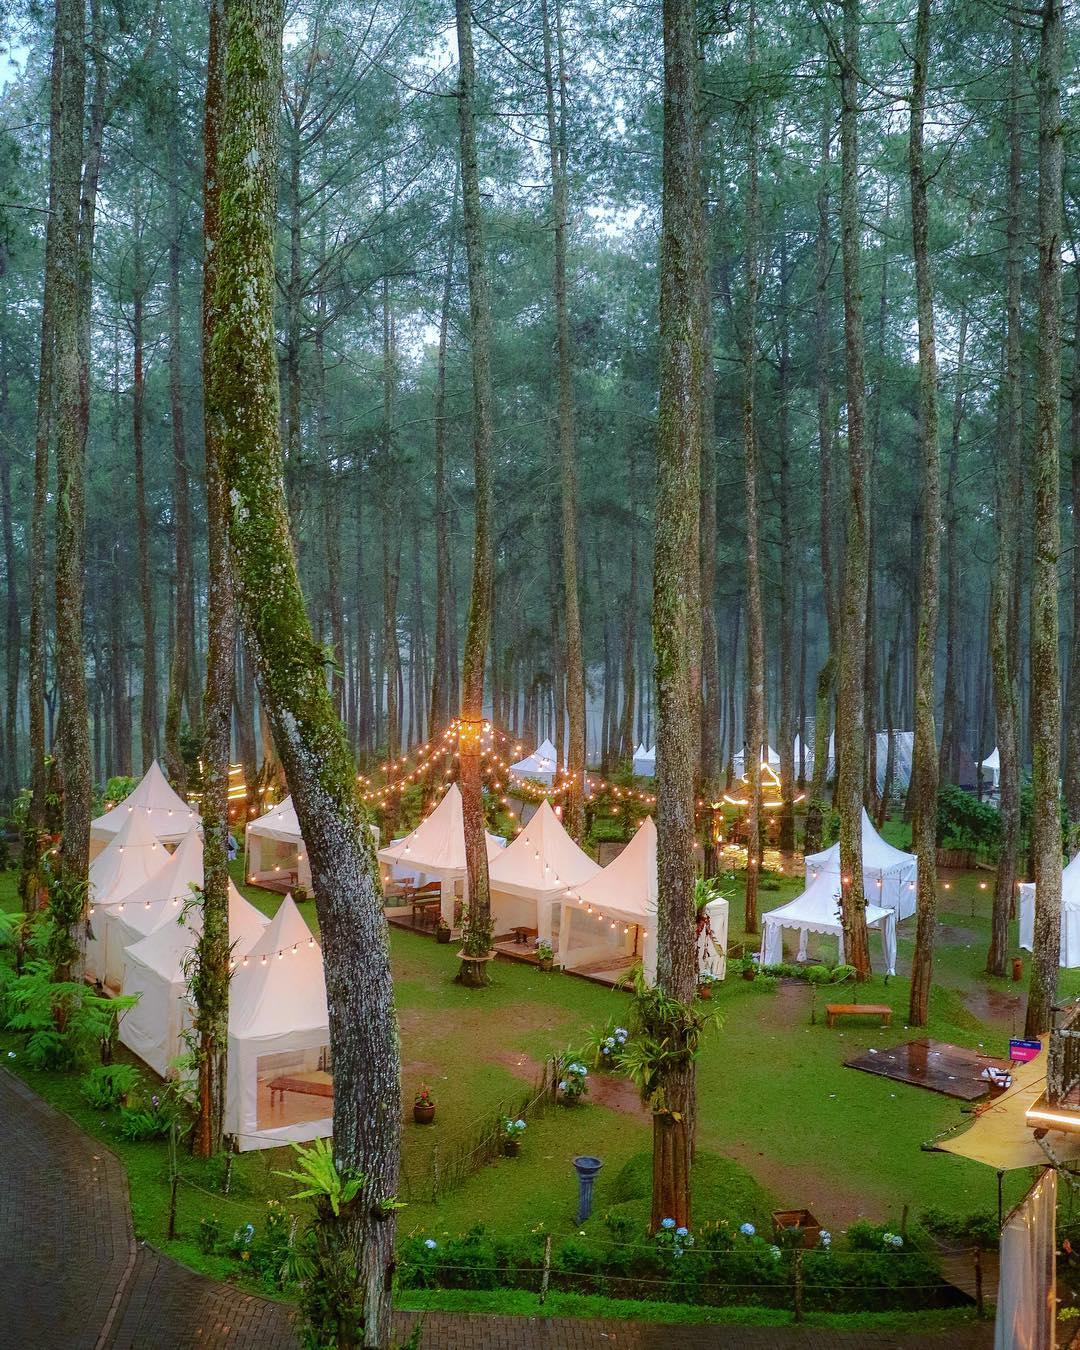 Orchid Forest Cikole Tempat Wisata Baru Di Bandung Barat